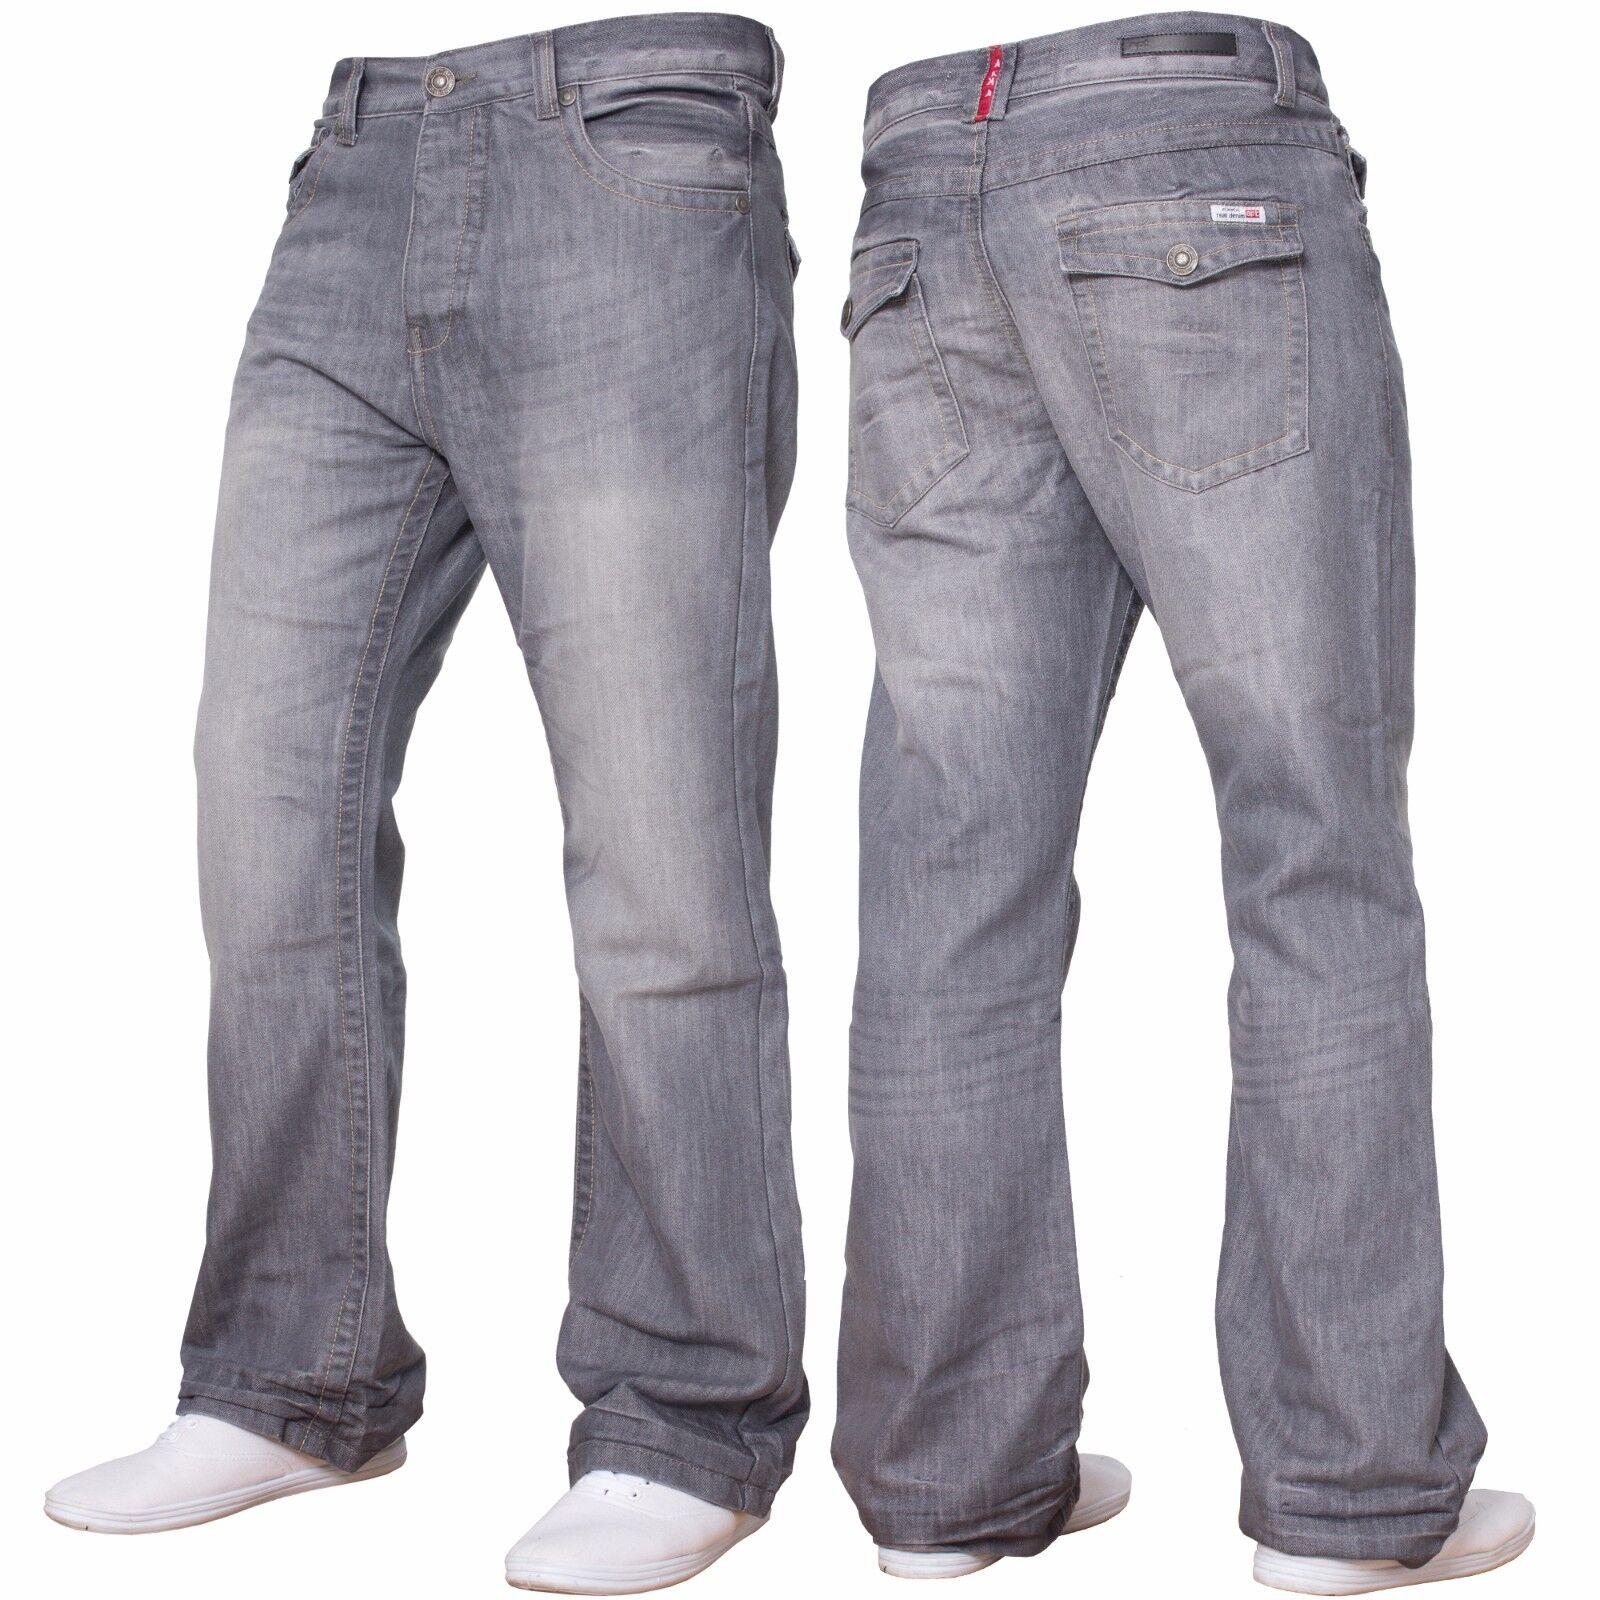 New Mens Designer Grey Bootcut Wide Leg Flared Denim Jeans All Waist Sizes